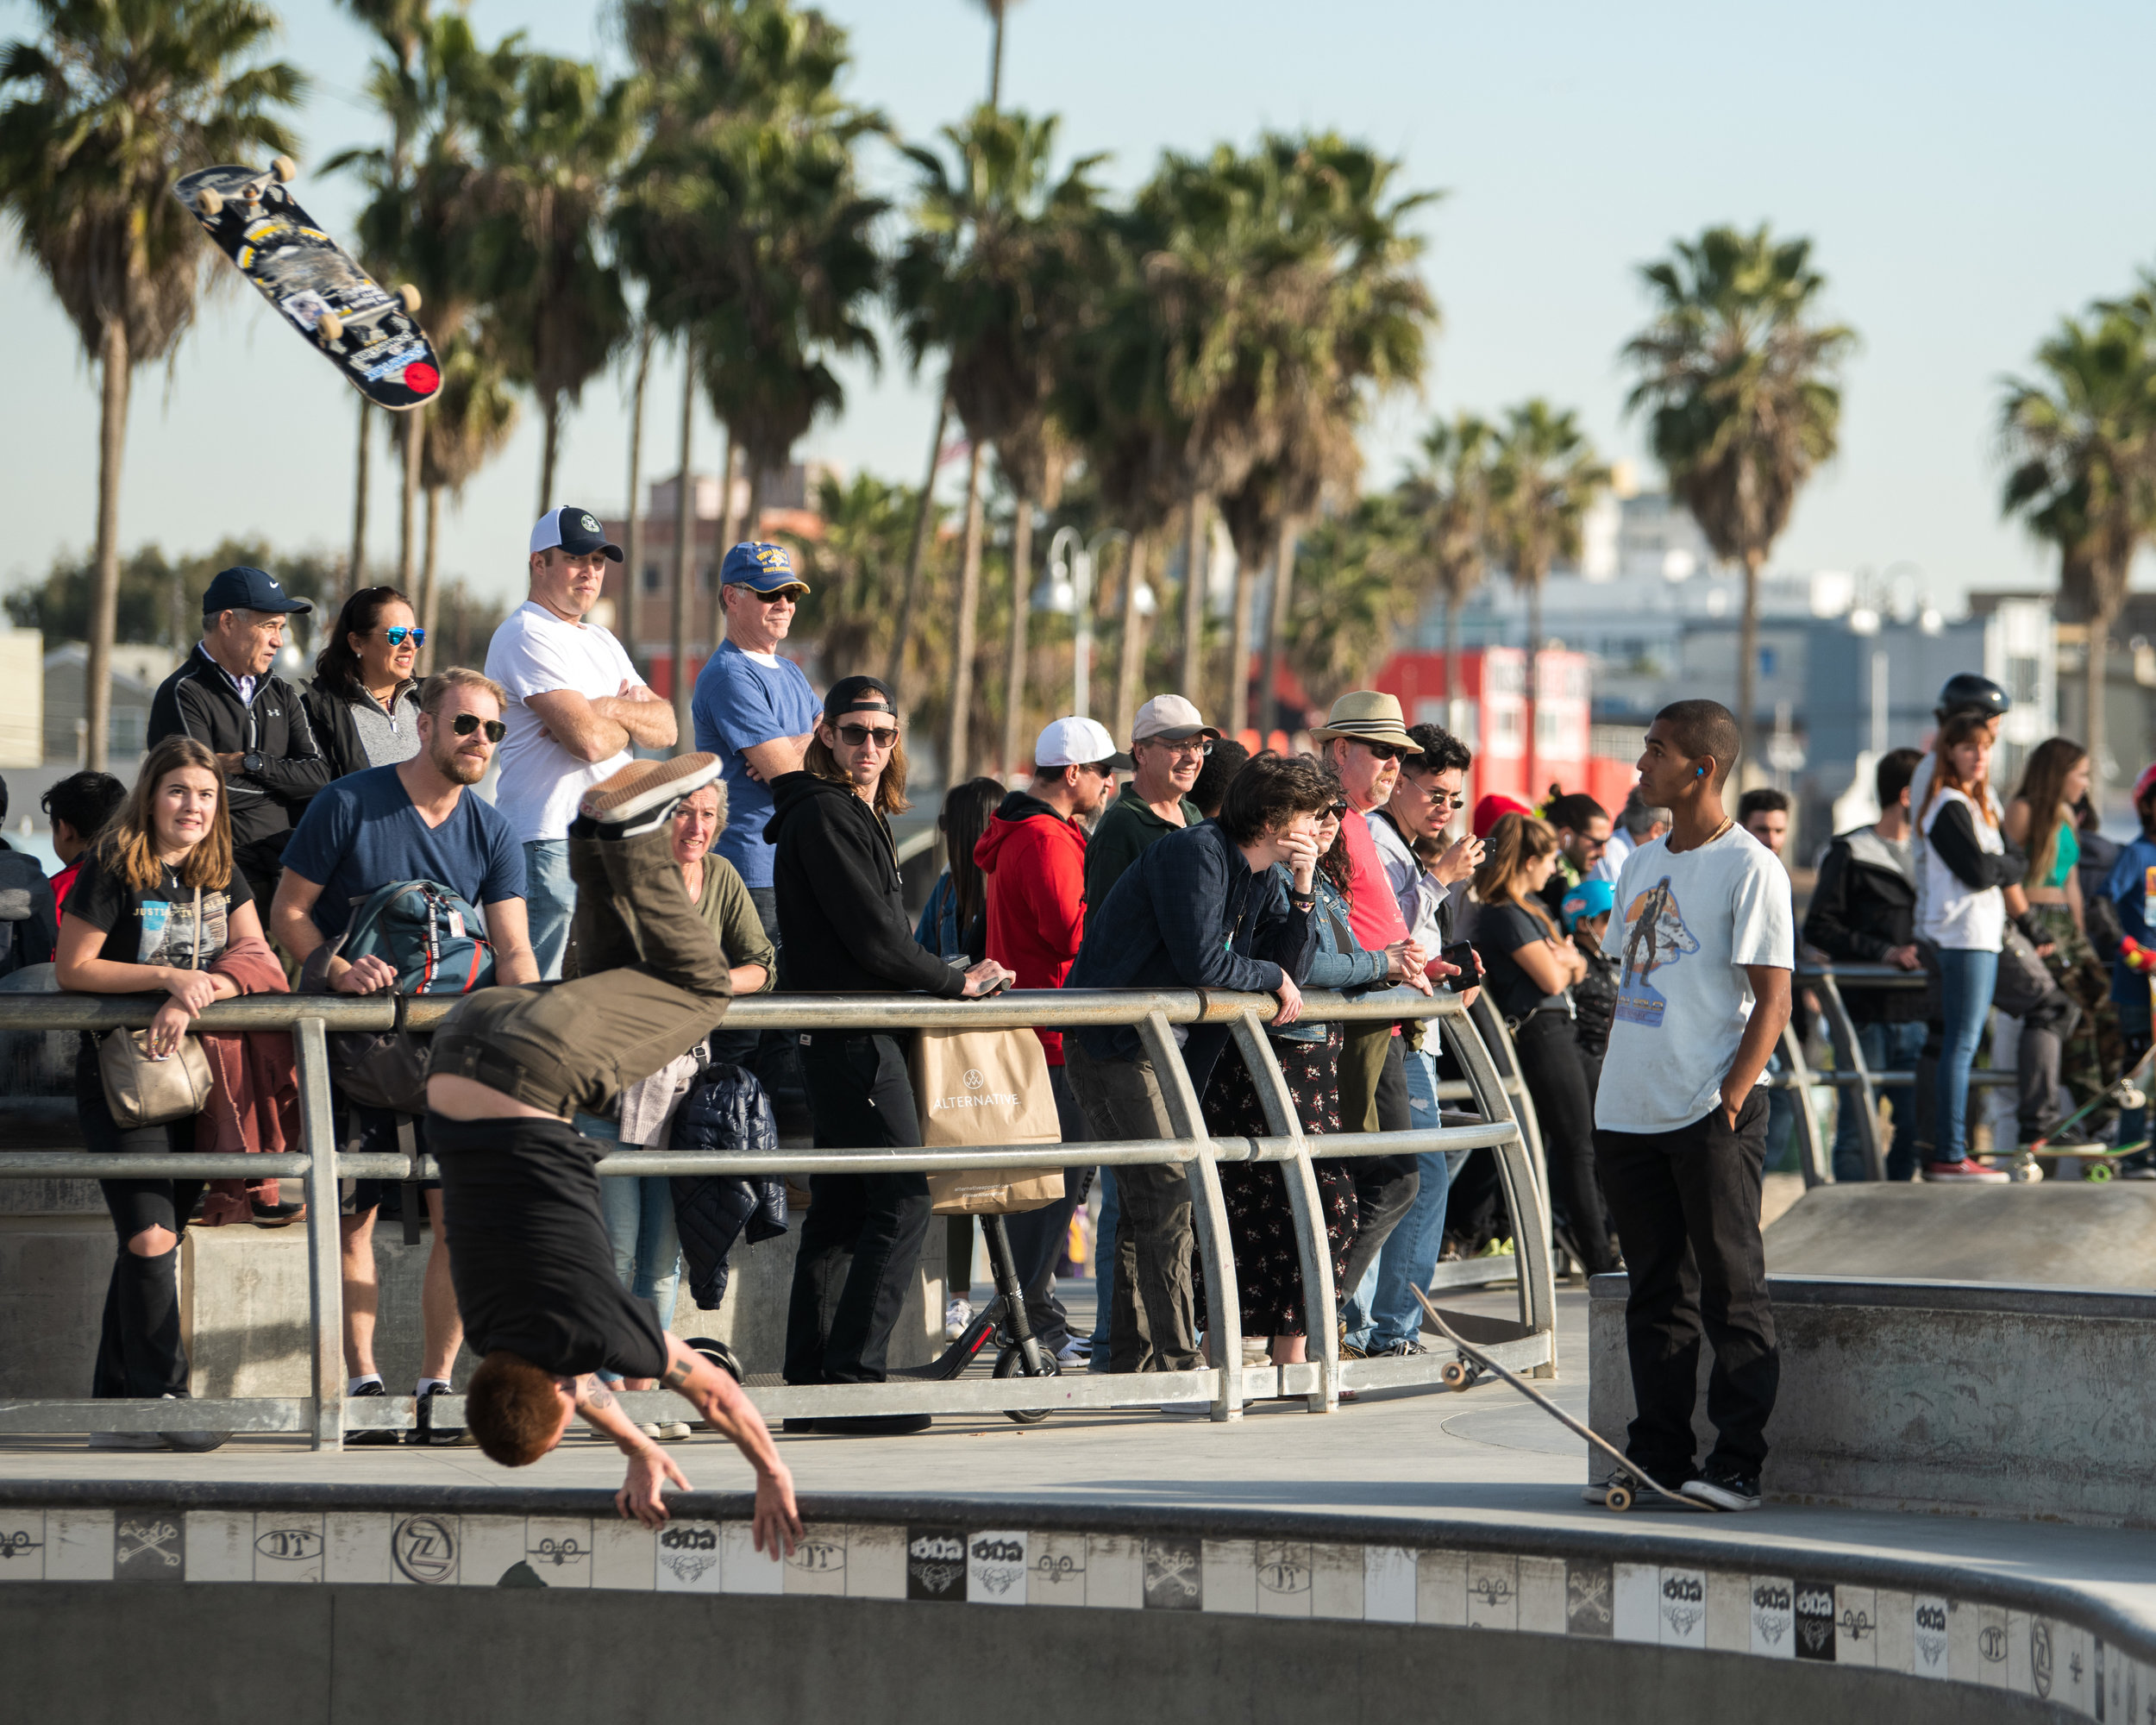 Venice Beach Skateboarders-17.jpg